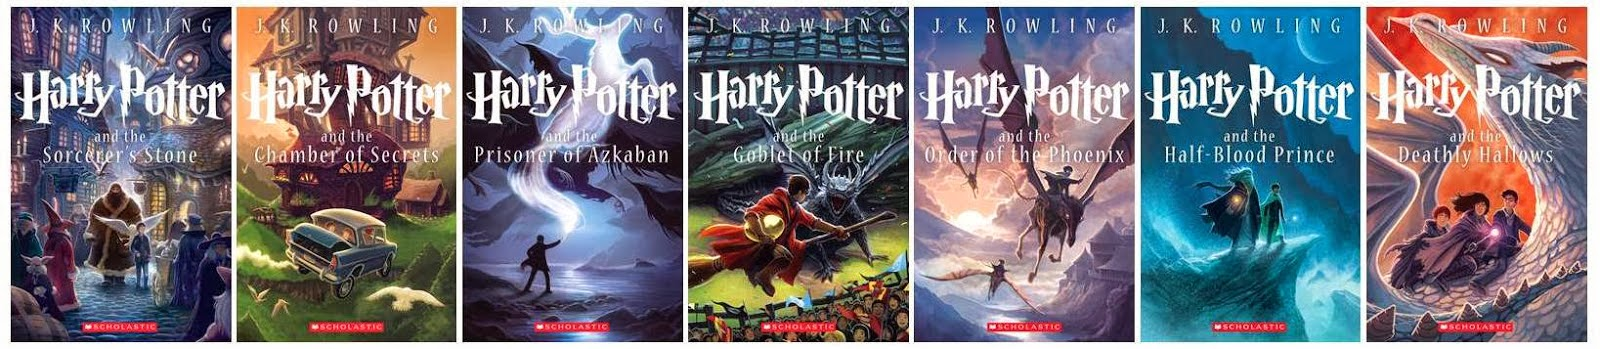 Harry-Potter-ultima-ed.jpg